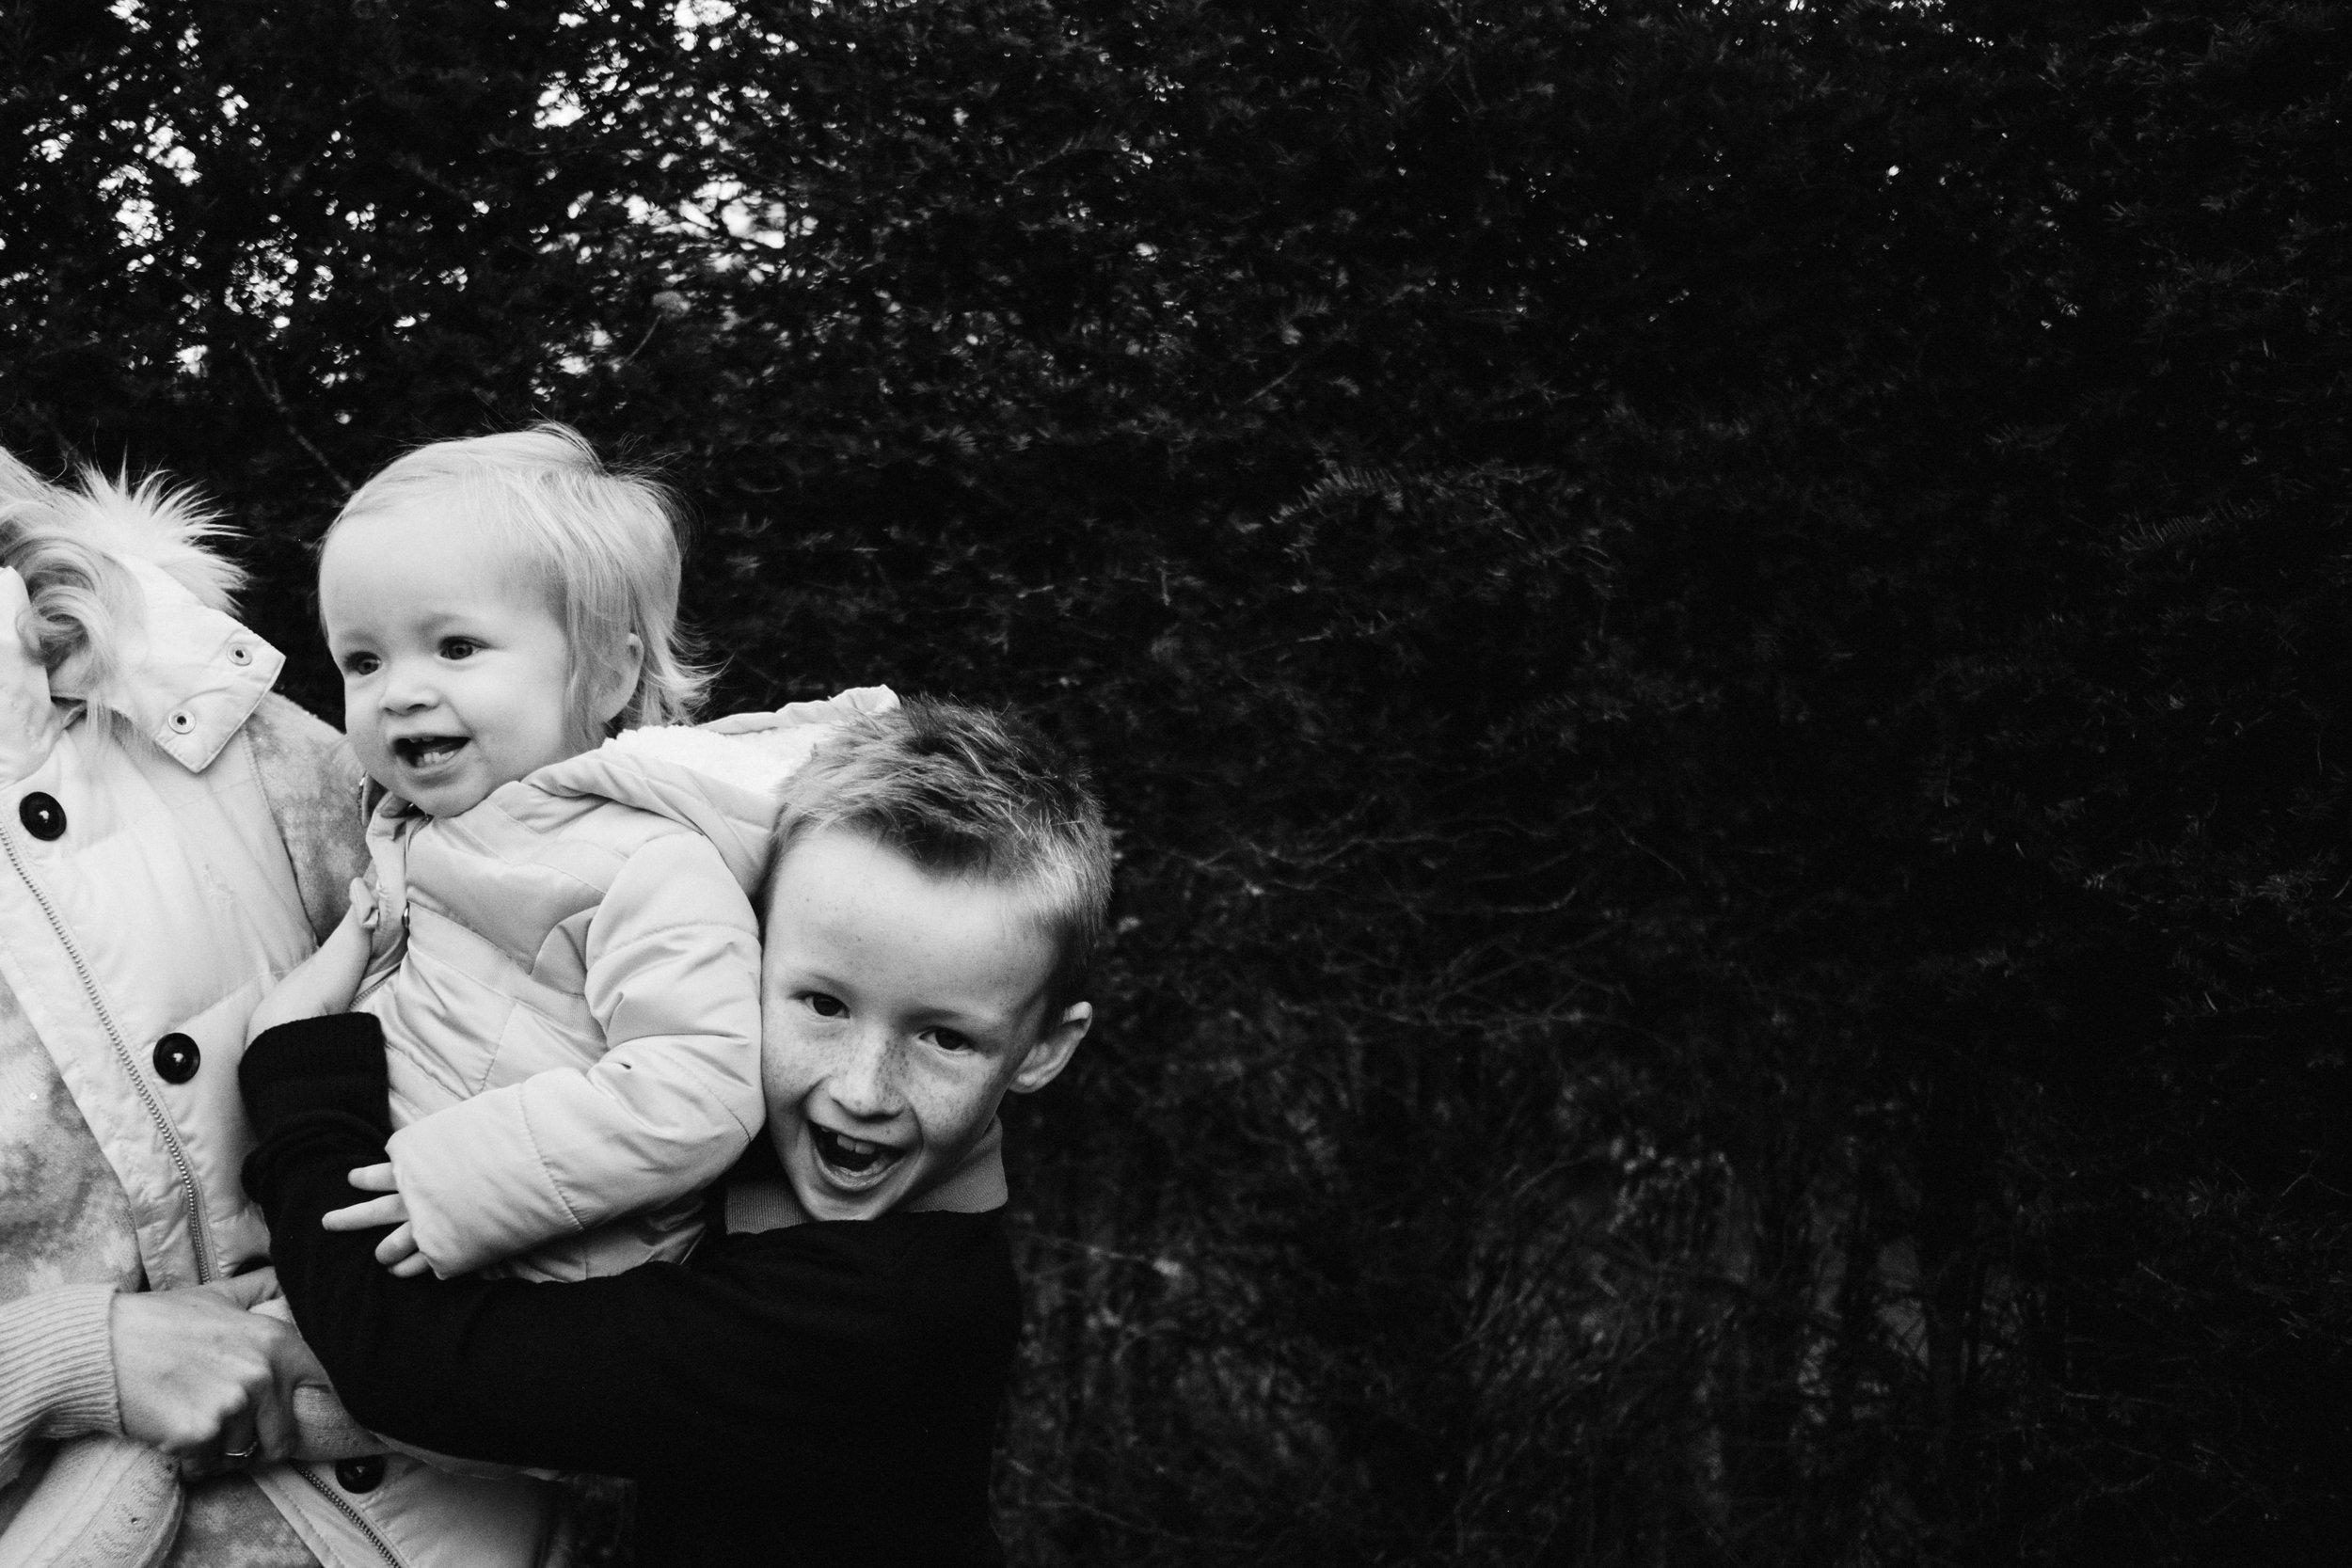 Young boy hugs his sister